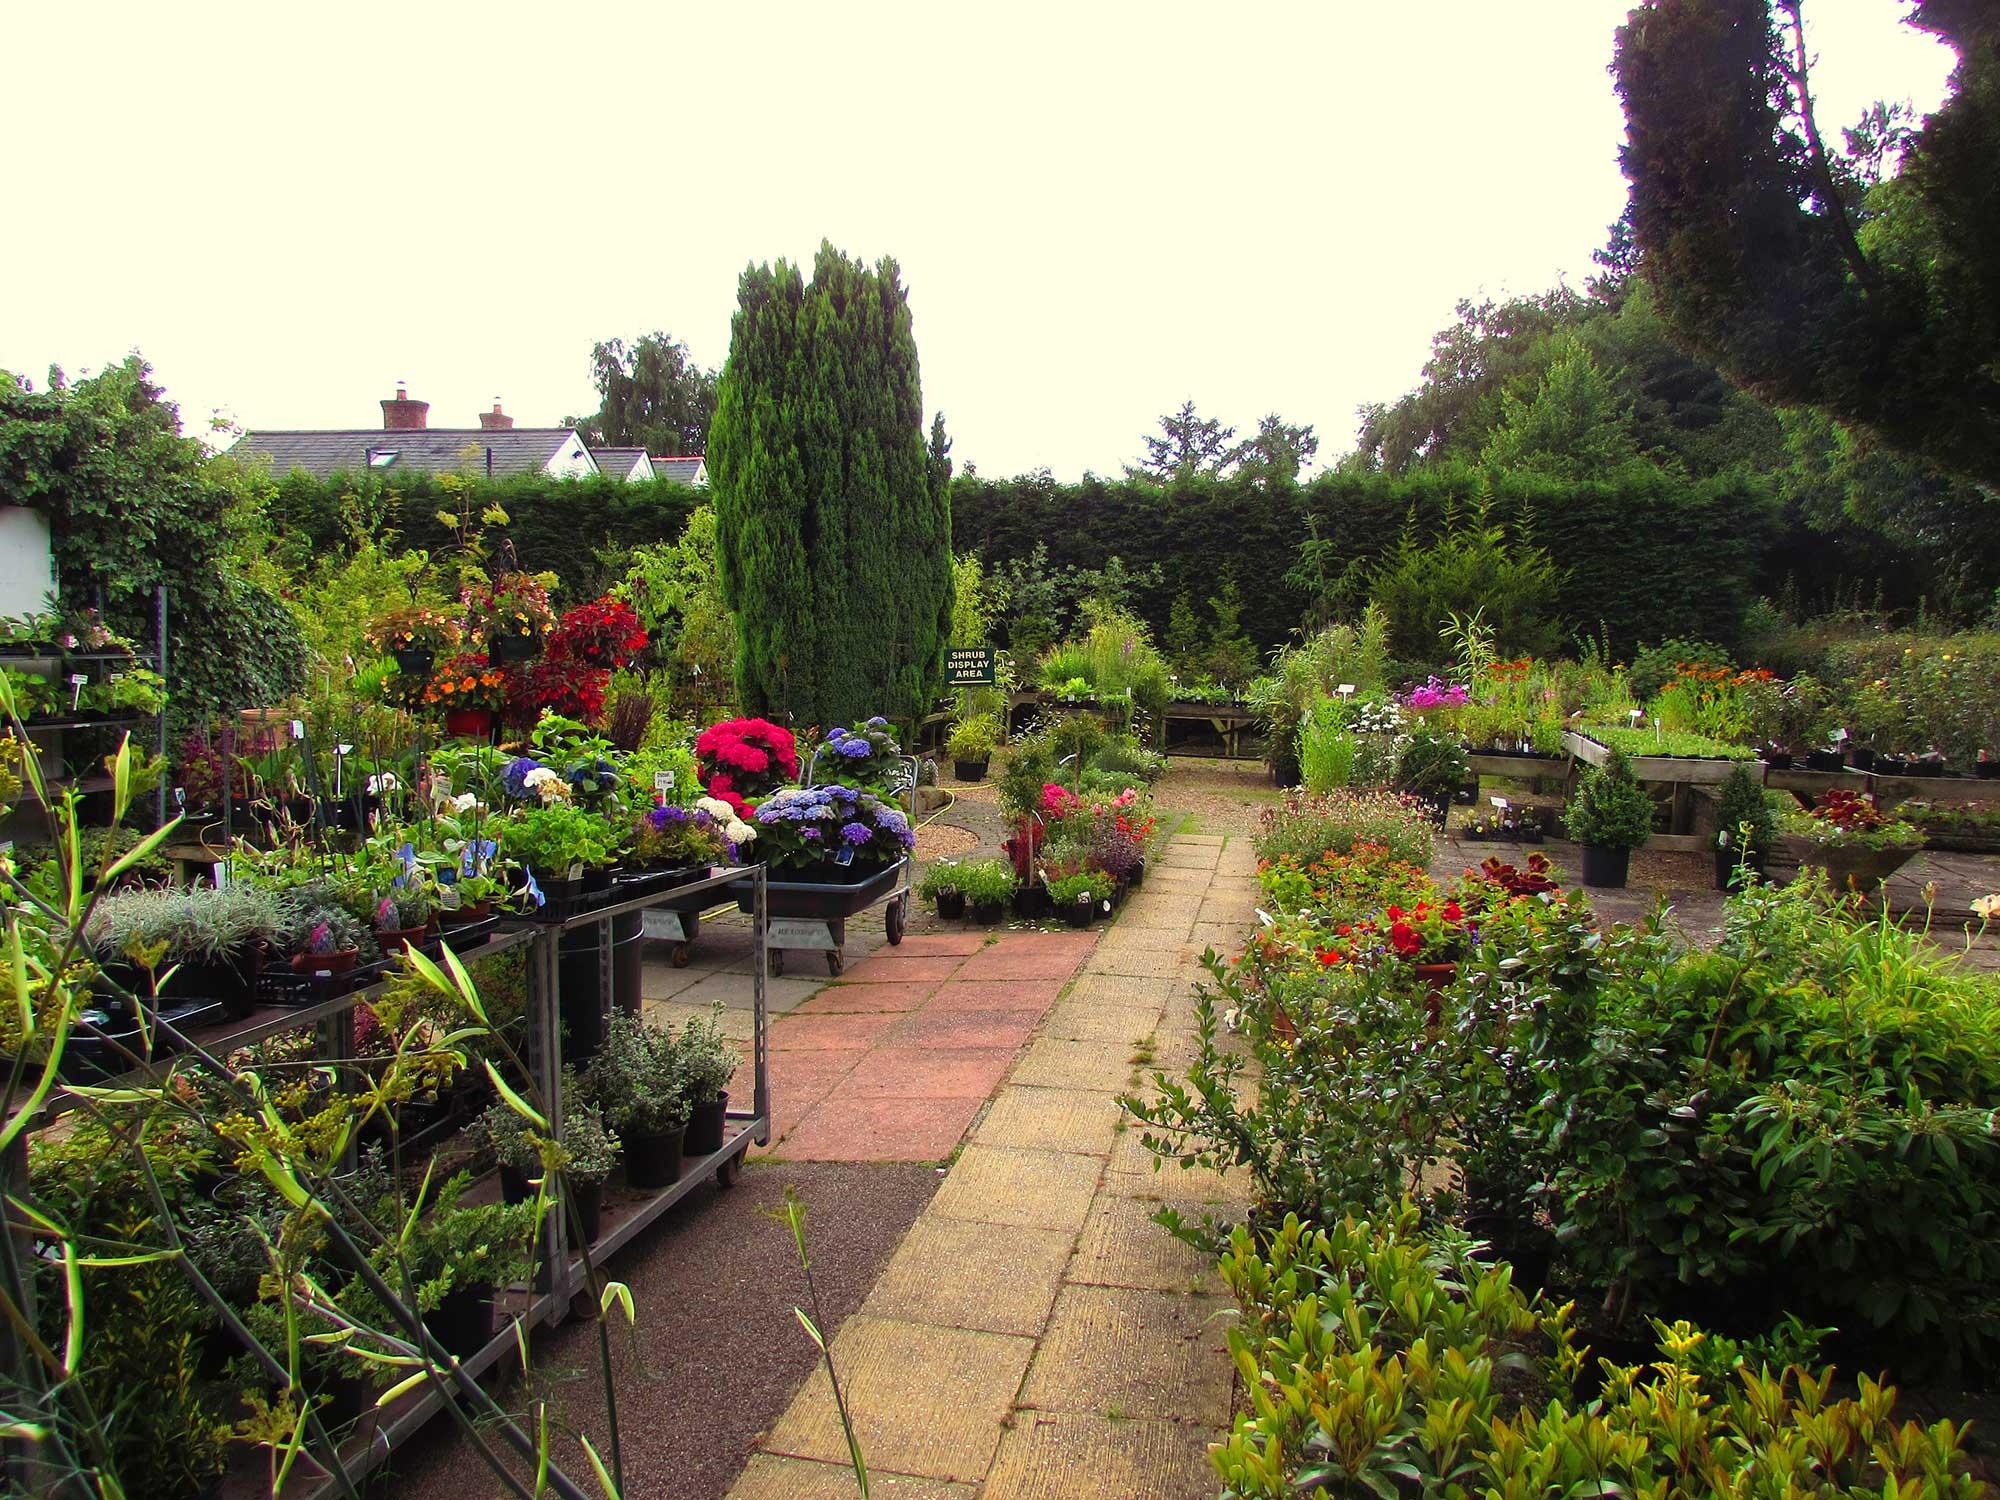 Garden Centre: Plants, Trees & Supplies